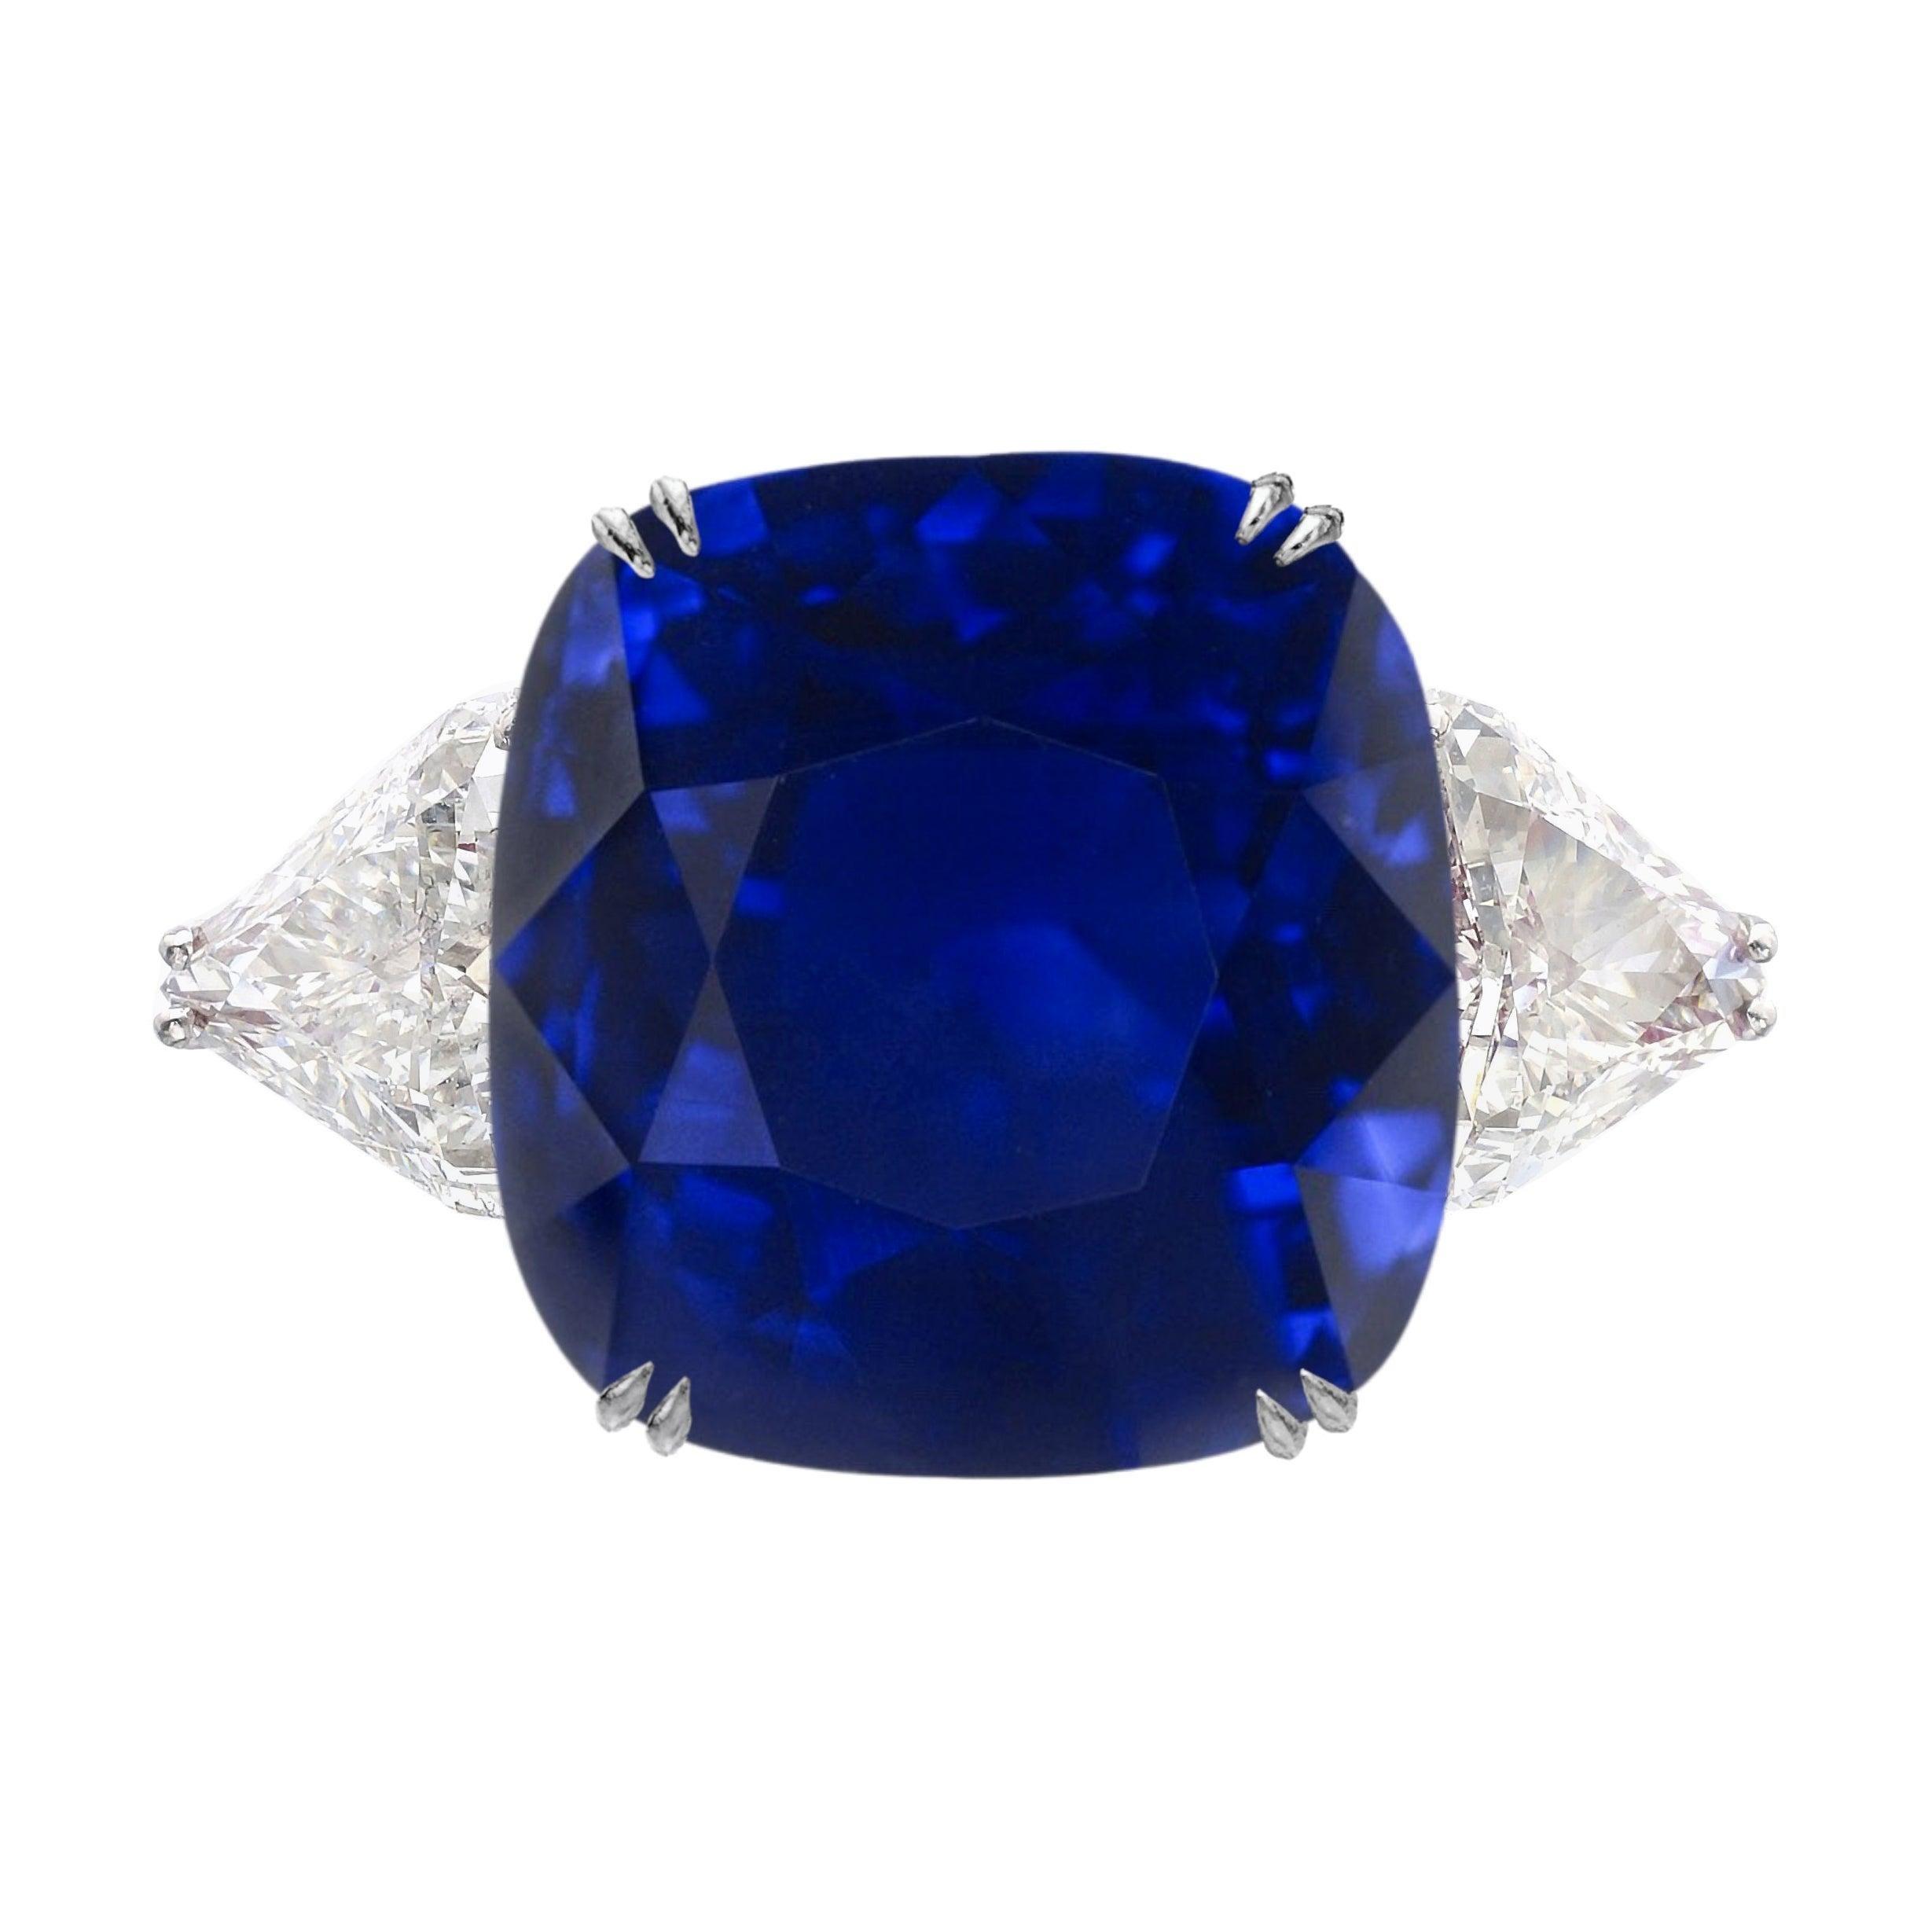 Flawless GRS Switzerland Deep Royal Blue 3 Carat Cushion Sapphire Ring